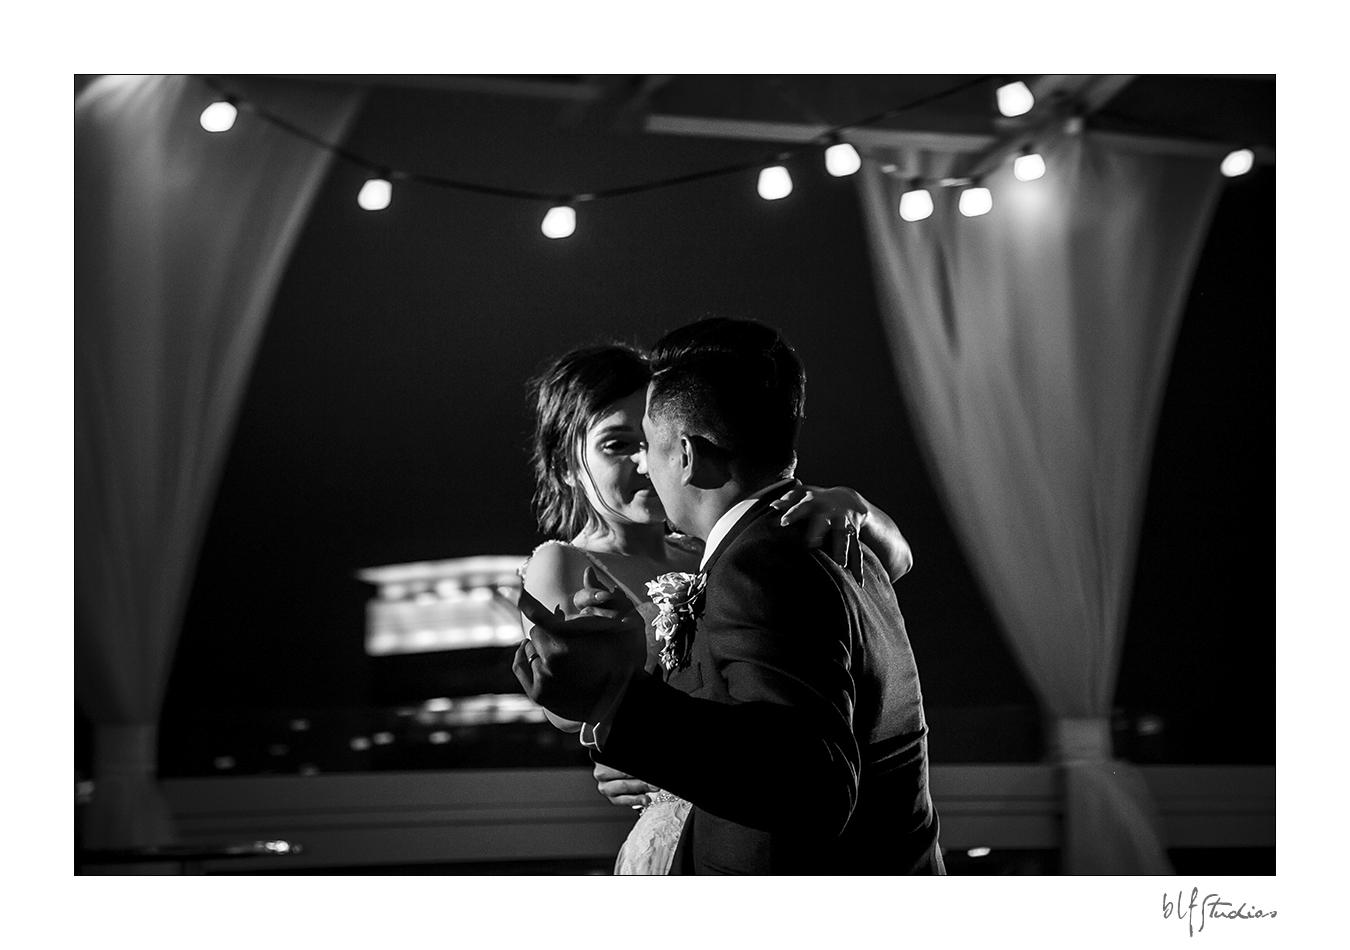 0037-blfstudios-wedding-photographer-daniel-danielle-atlanta.jpg